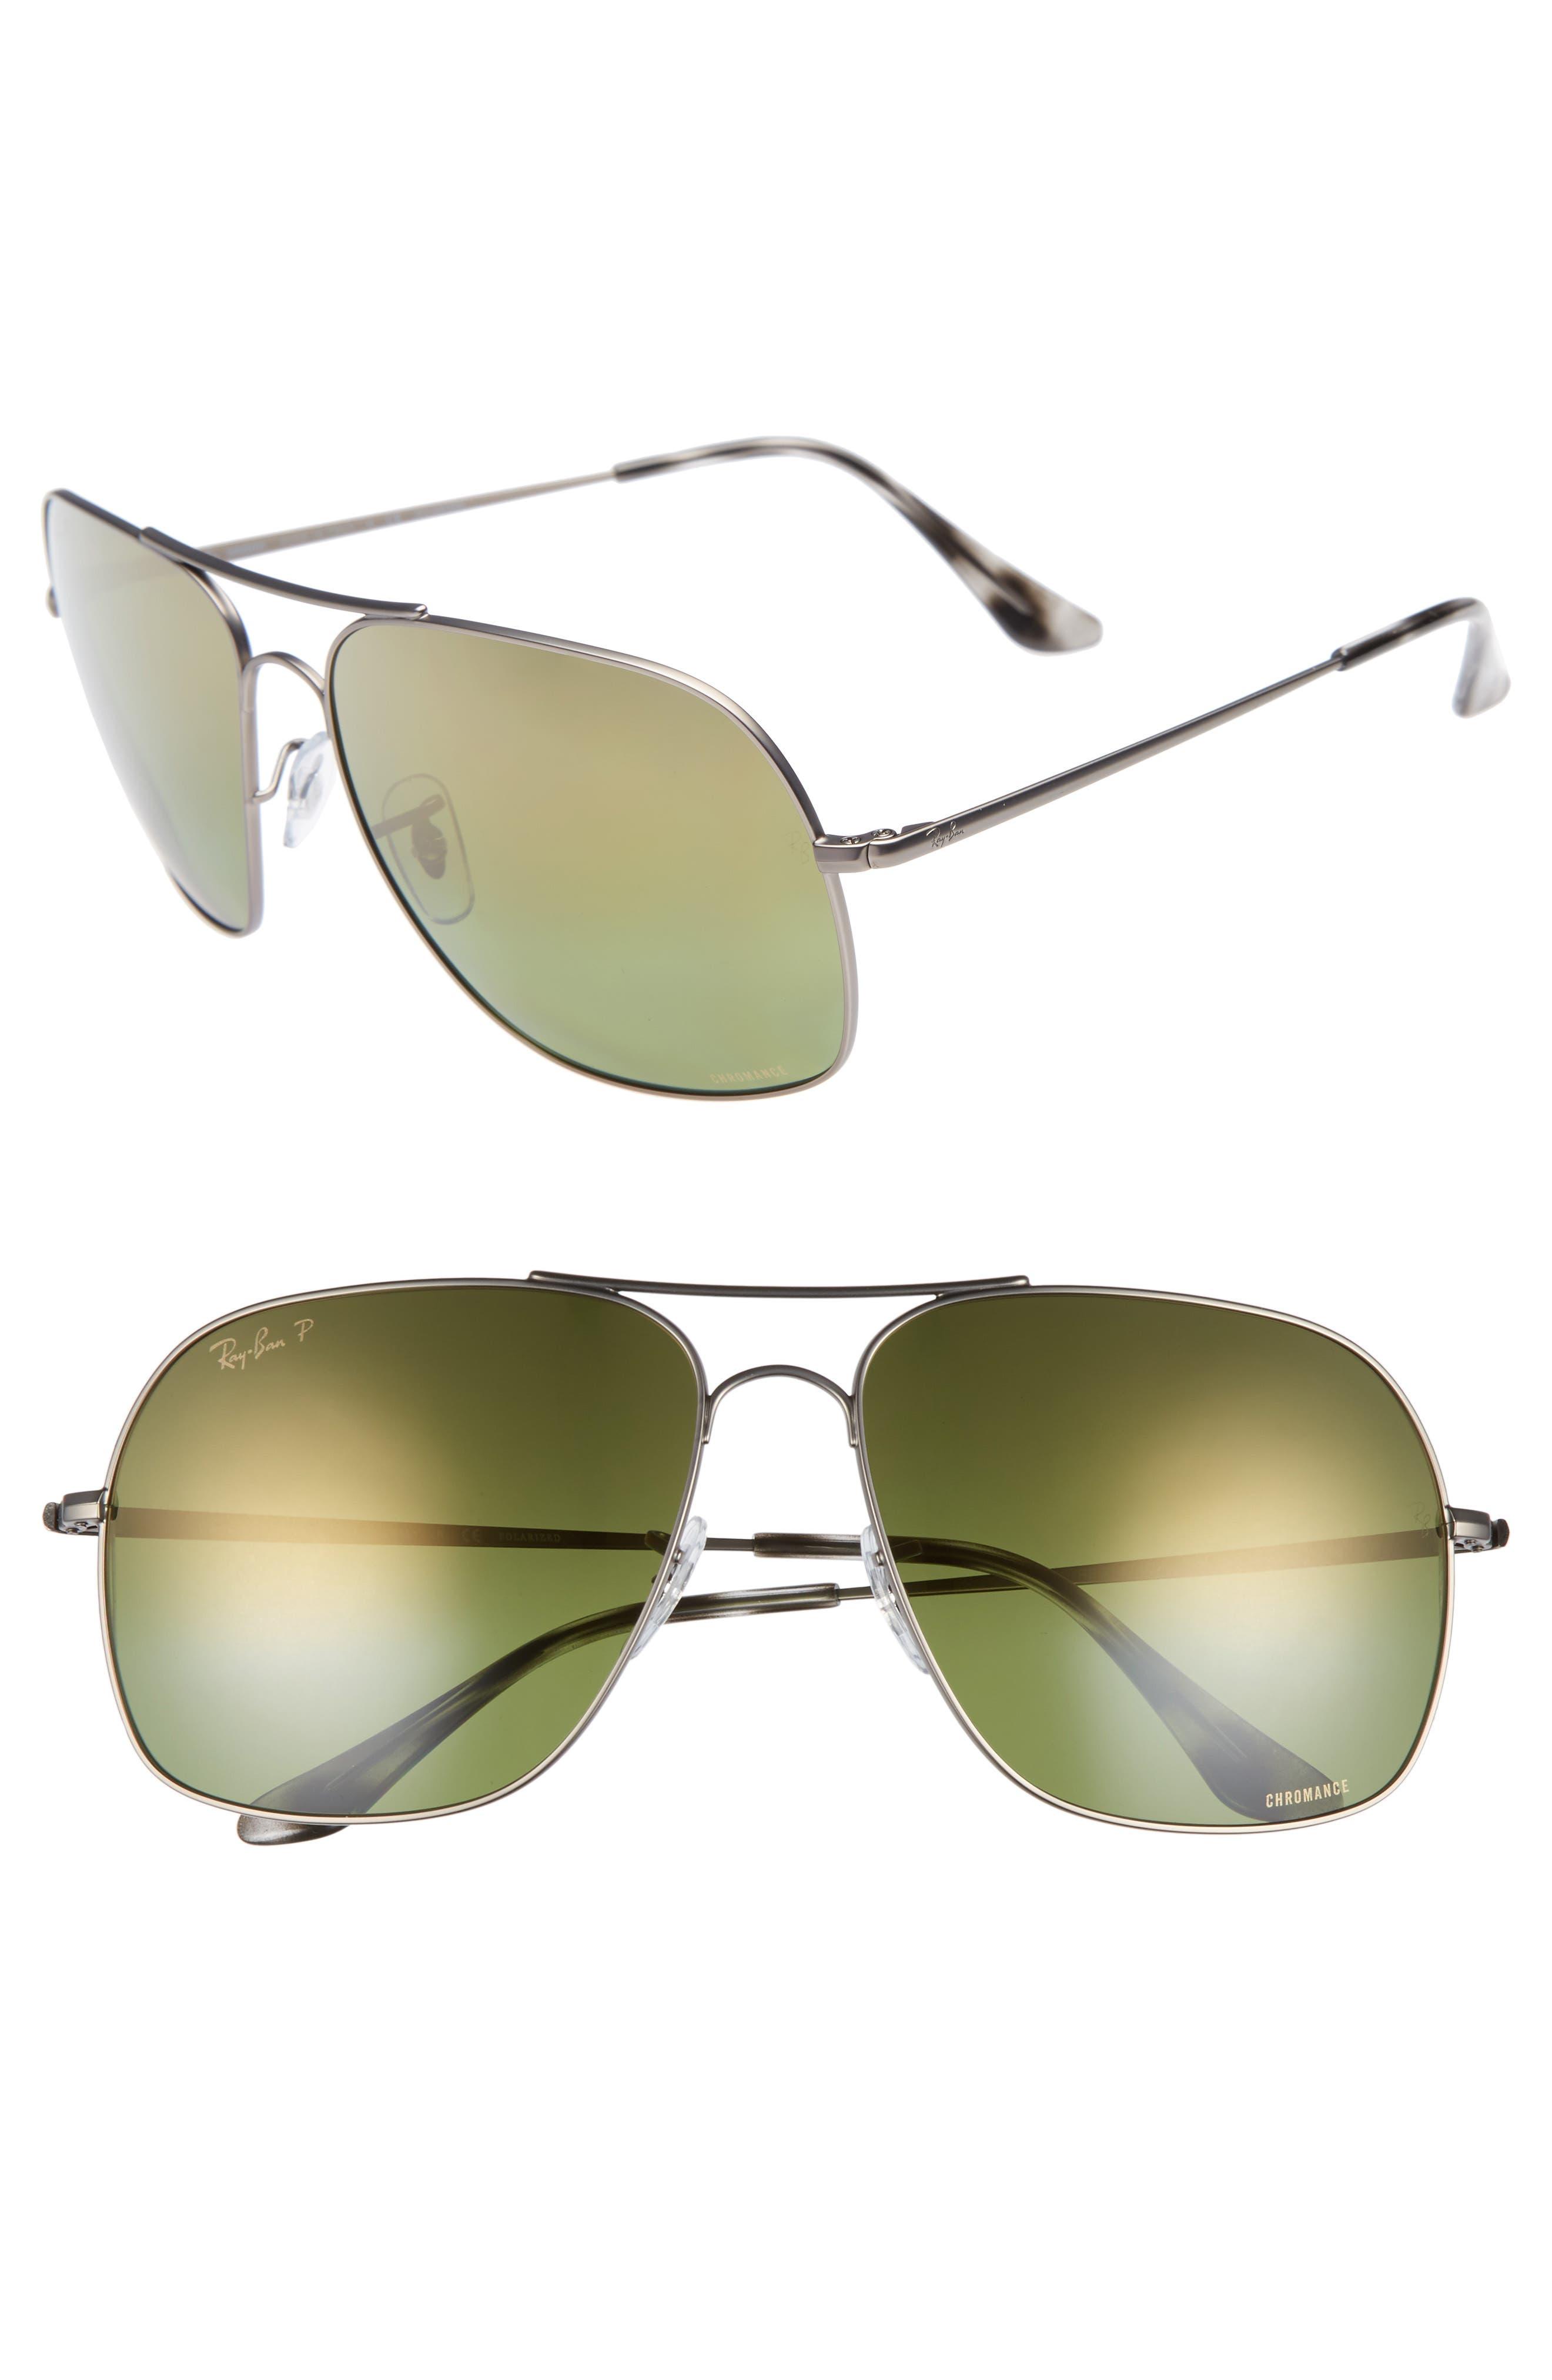 Chromance 61mm Double Bridge Aviator Sunglasses,                         Main,                         color, Gunmetal/ Green